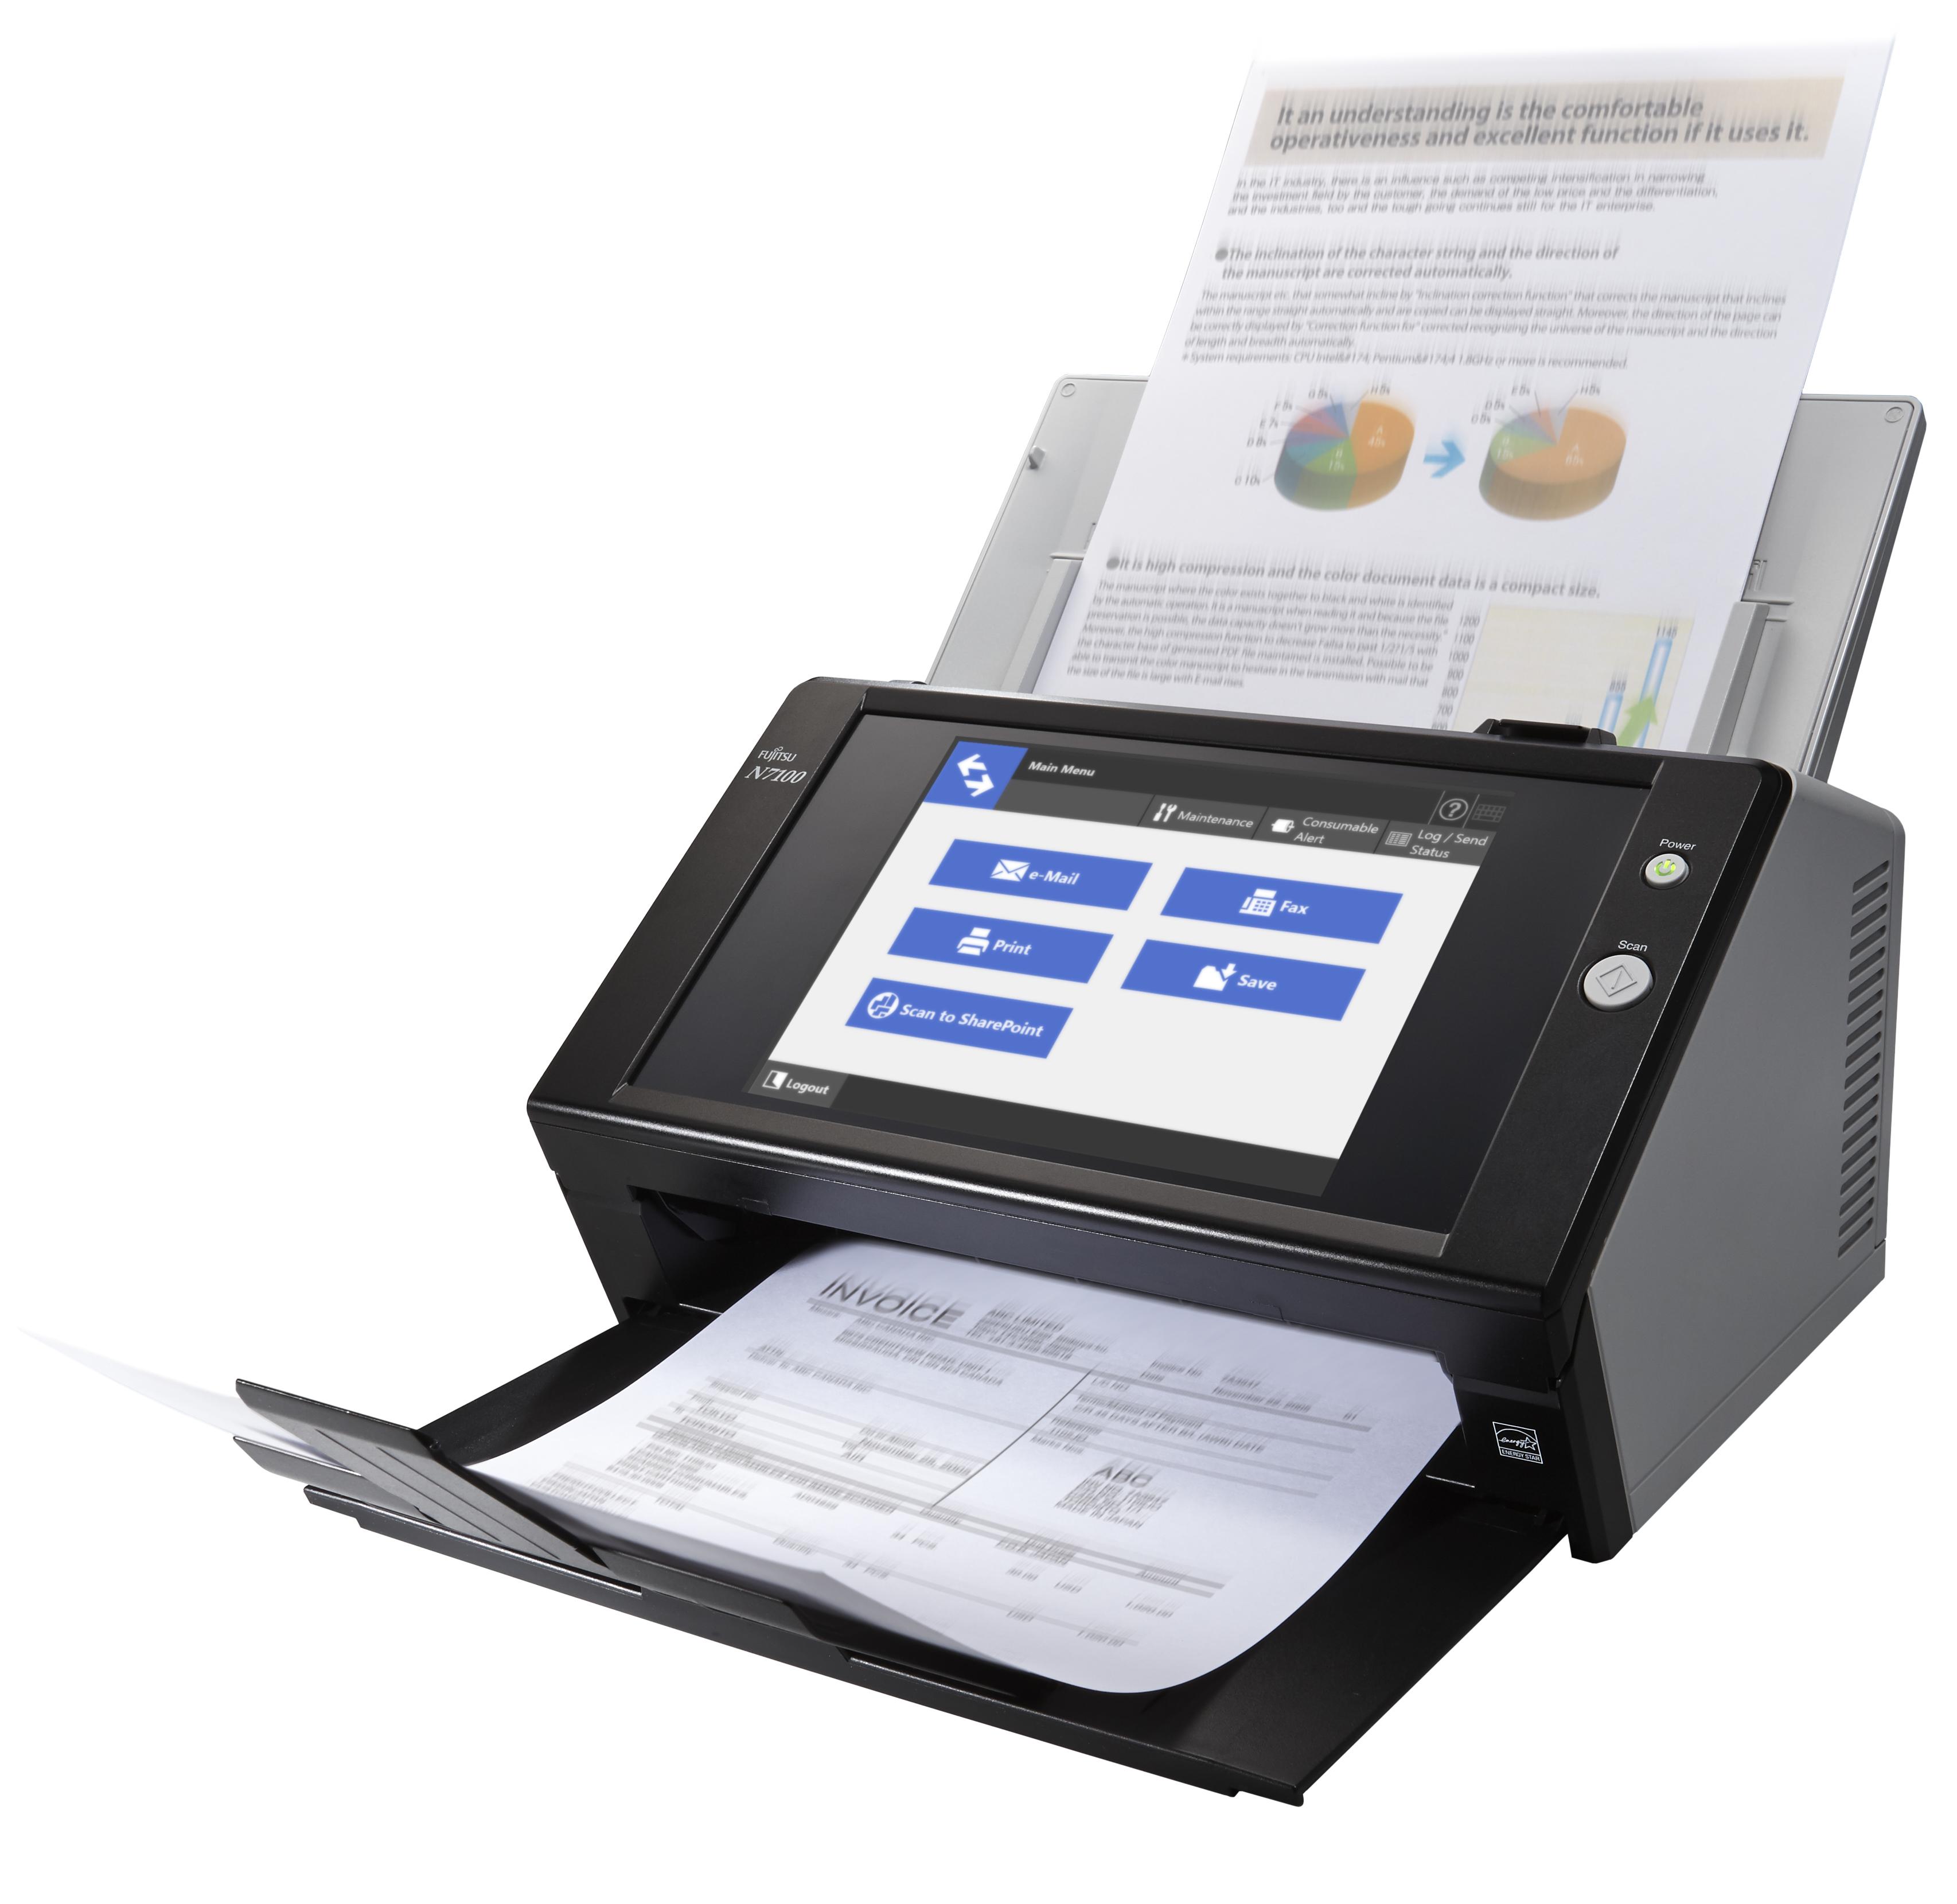 Fujitsu Network Scanner N7100 - Dokumentenscanner - 600x600 dpi - A4